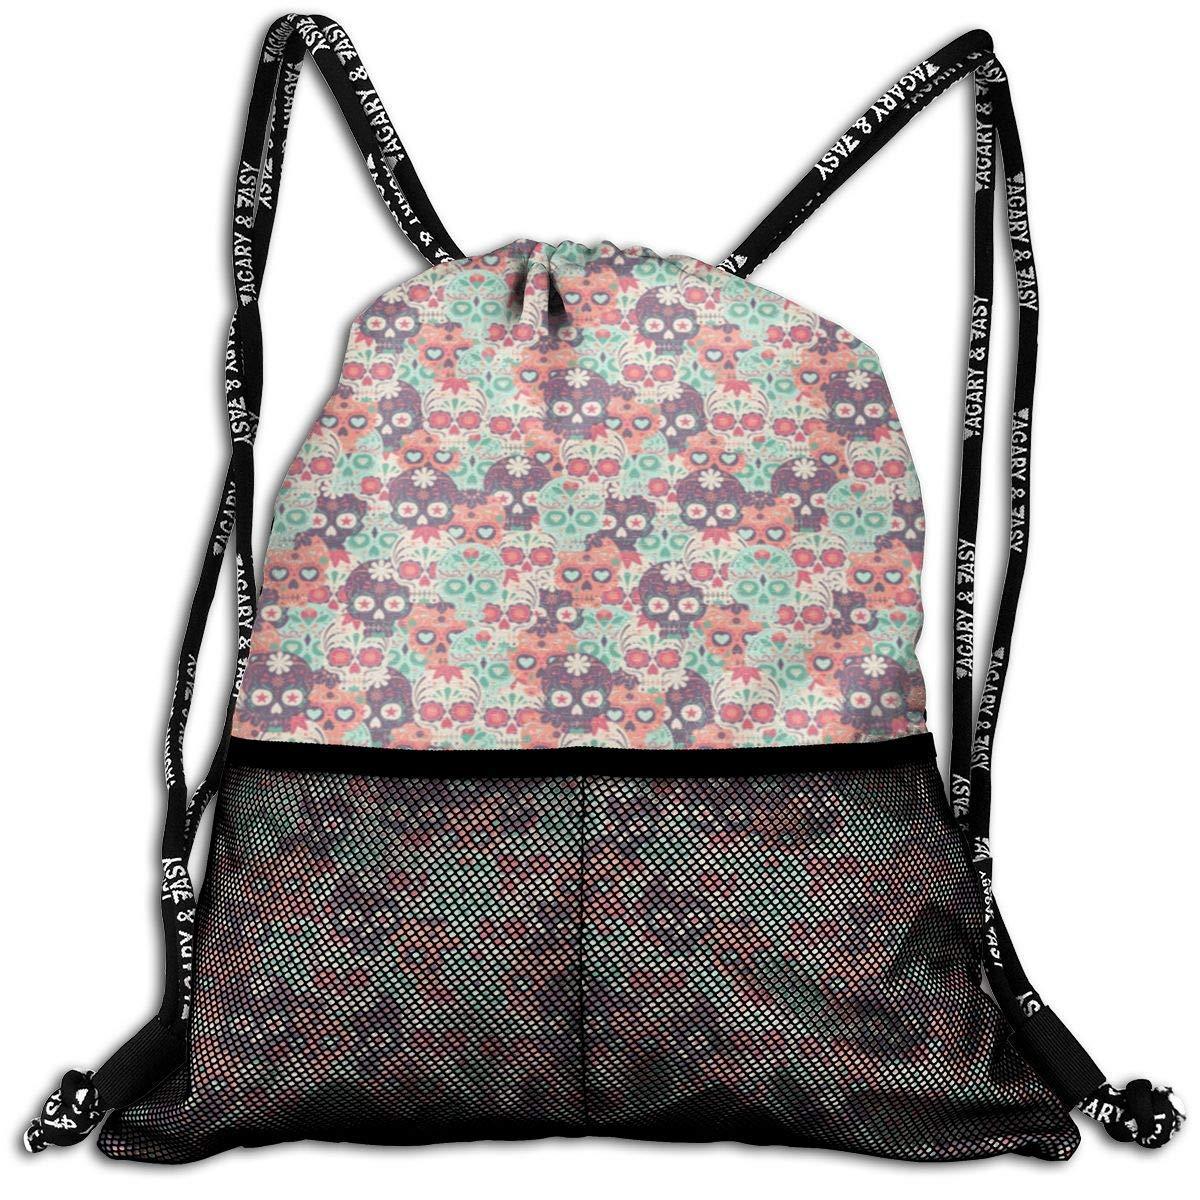 LINGJIE Lightweight Foldable Large Capacity JGMRKD Unisex Drawstring Bundle Casual Rucksack with Mesh Traveling Backpack Bag Sugar Skull